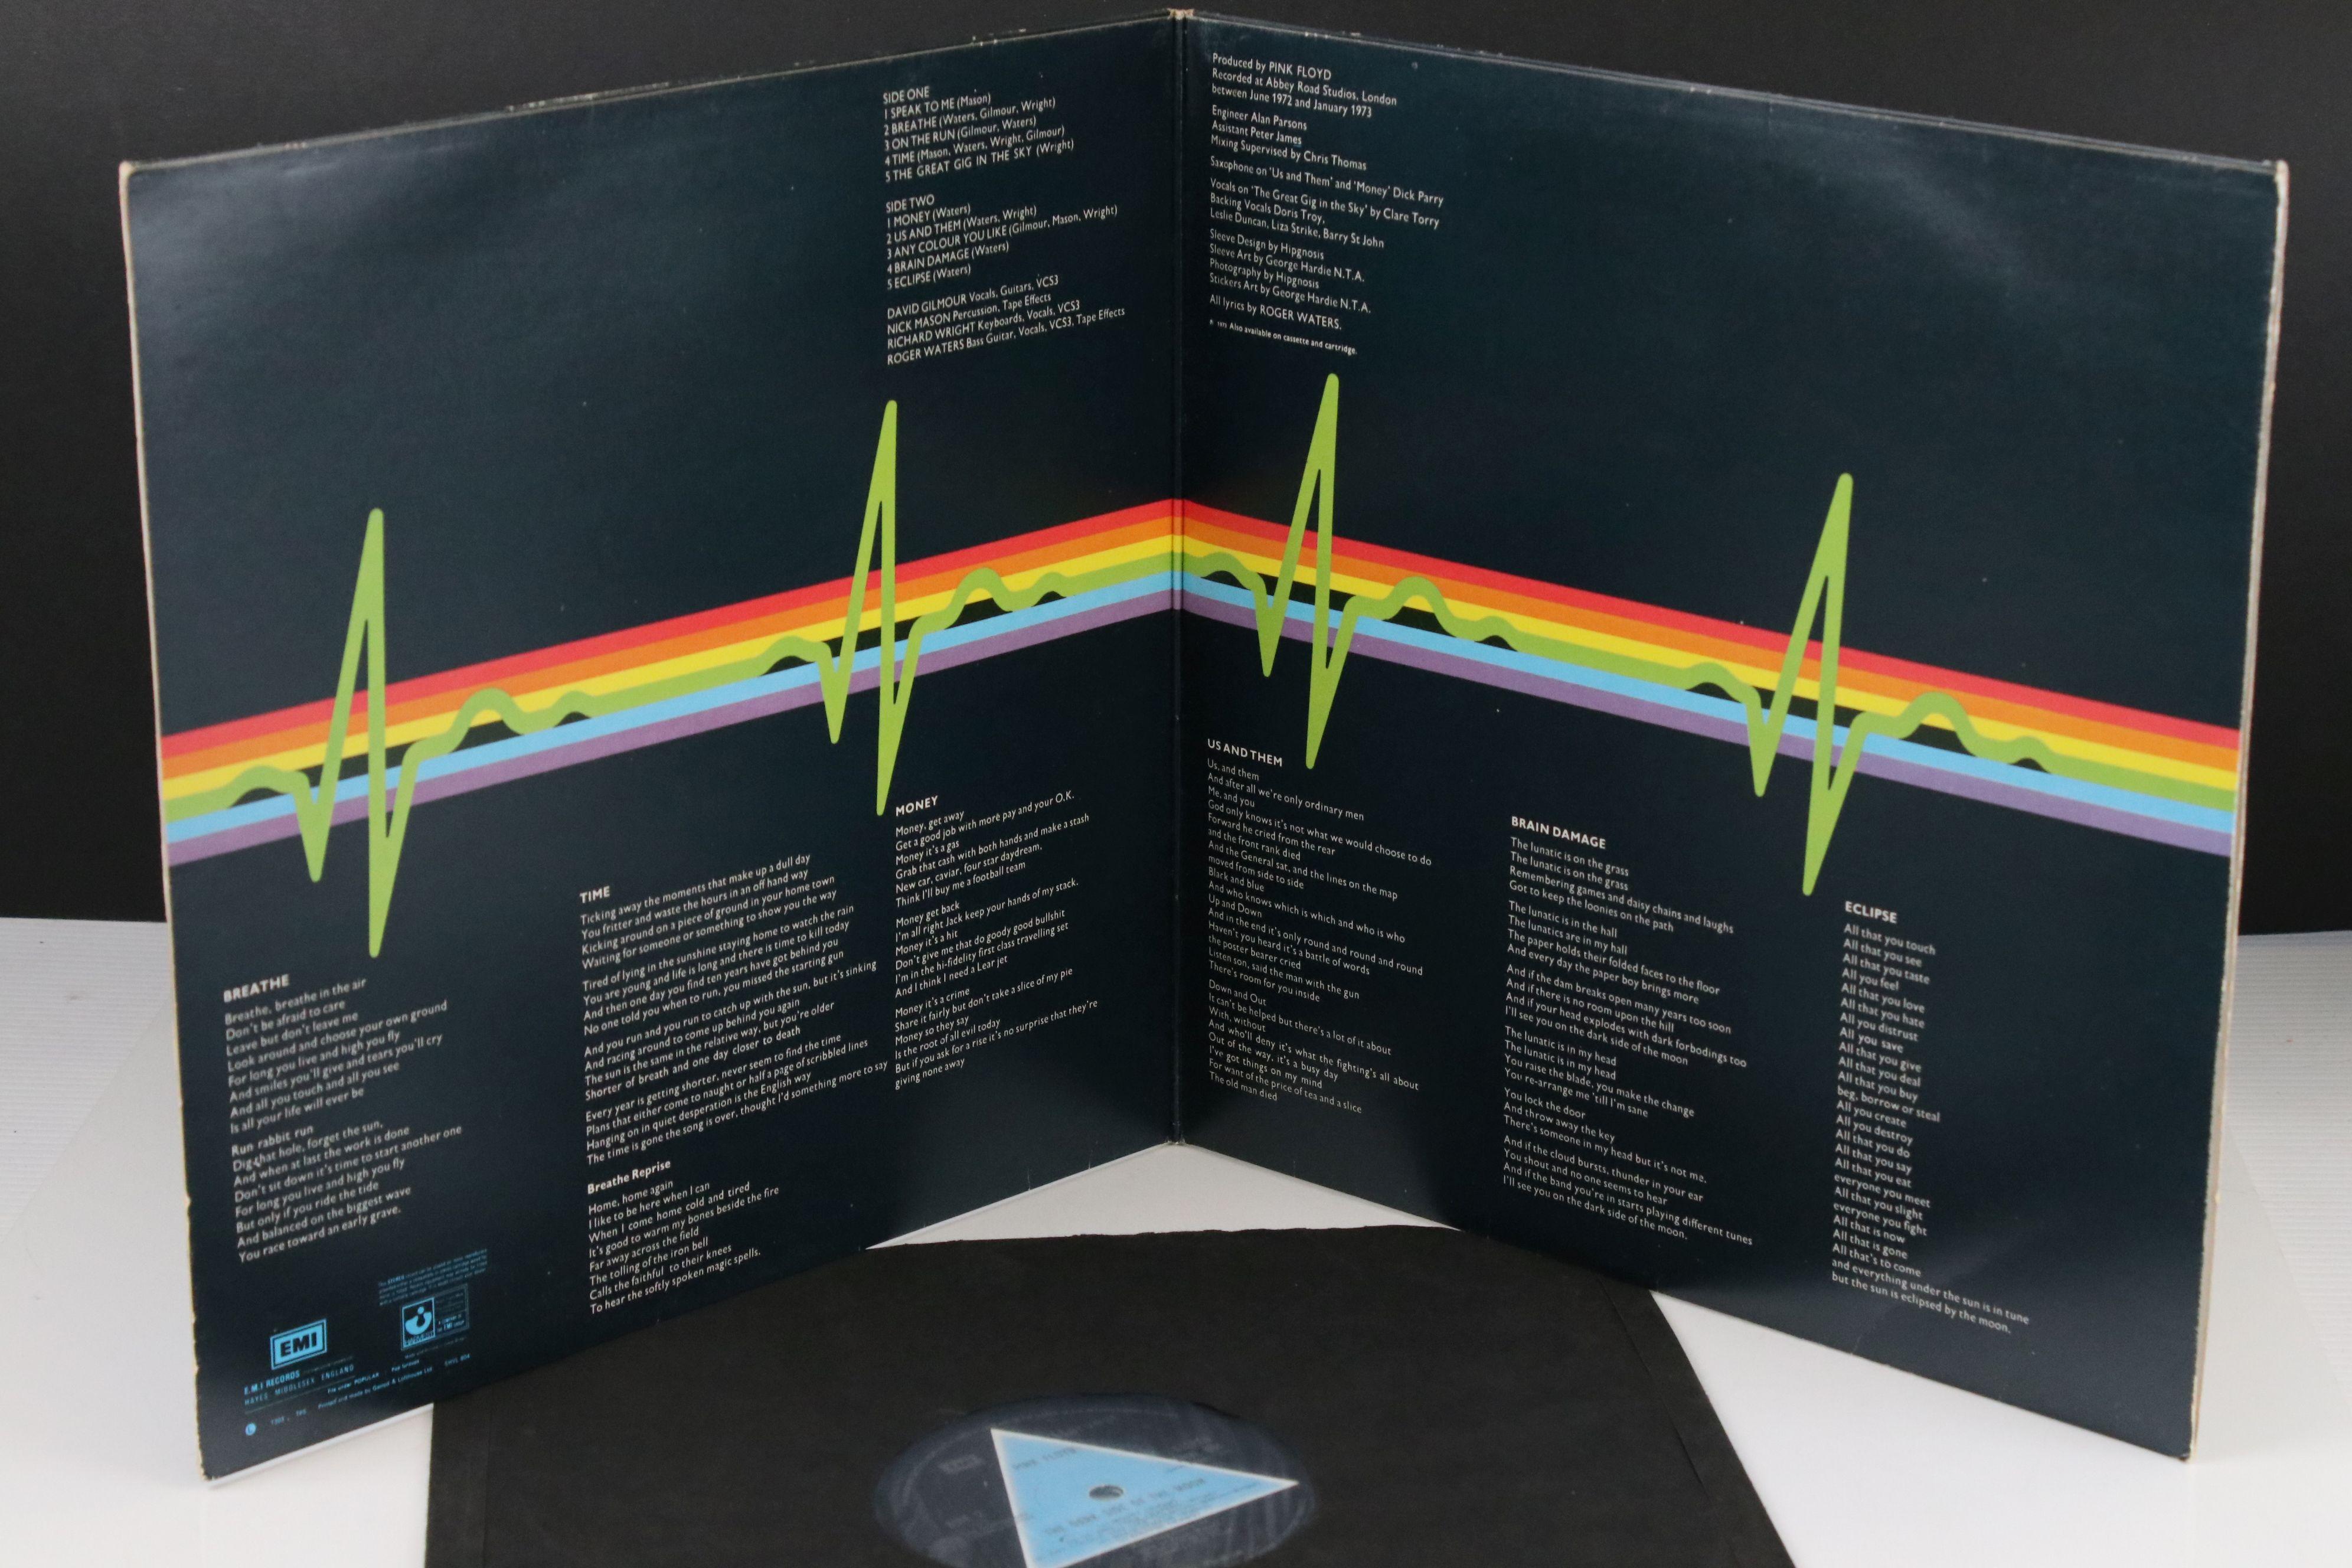 Vinyl - Pink Floyd Dark Side of The Moon LP on Harvest SHVL804 Stereo, solid light blue triangle, no - Image 5 of 6